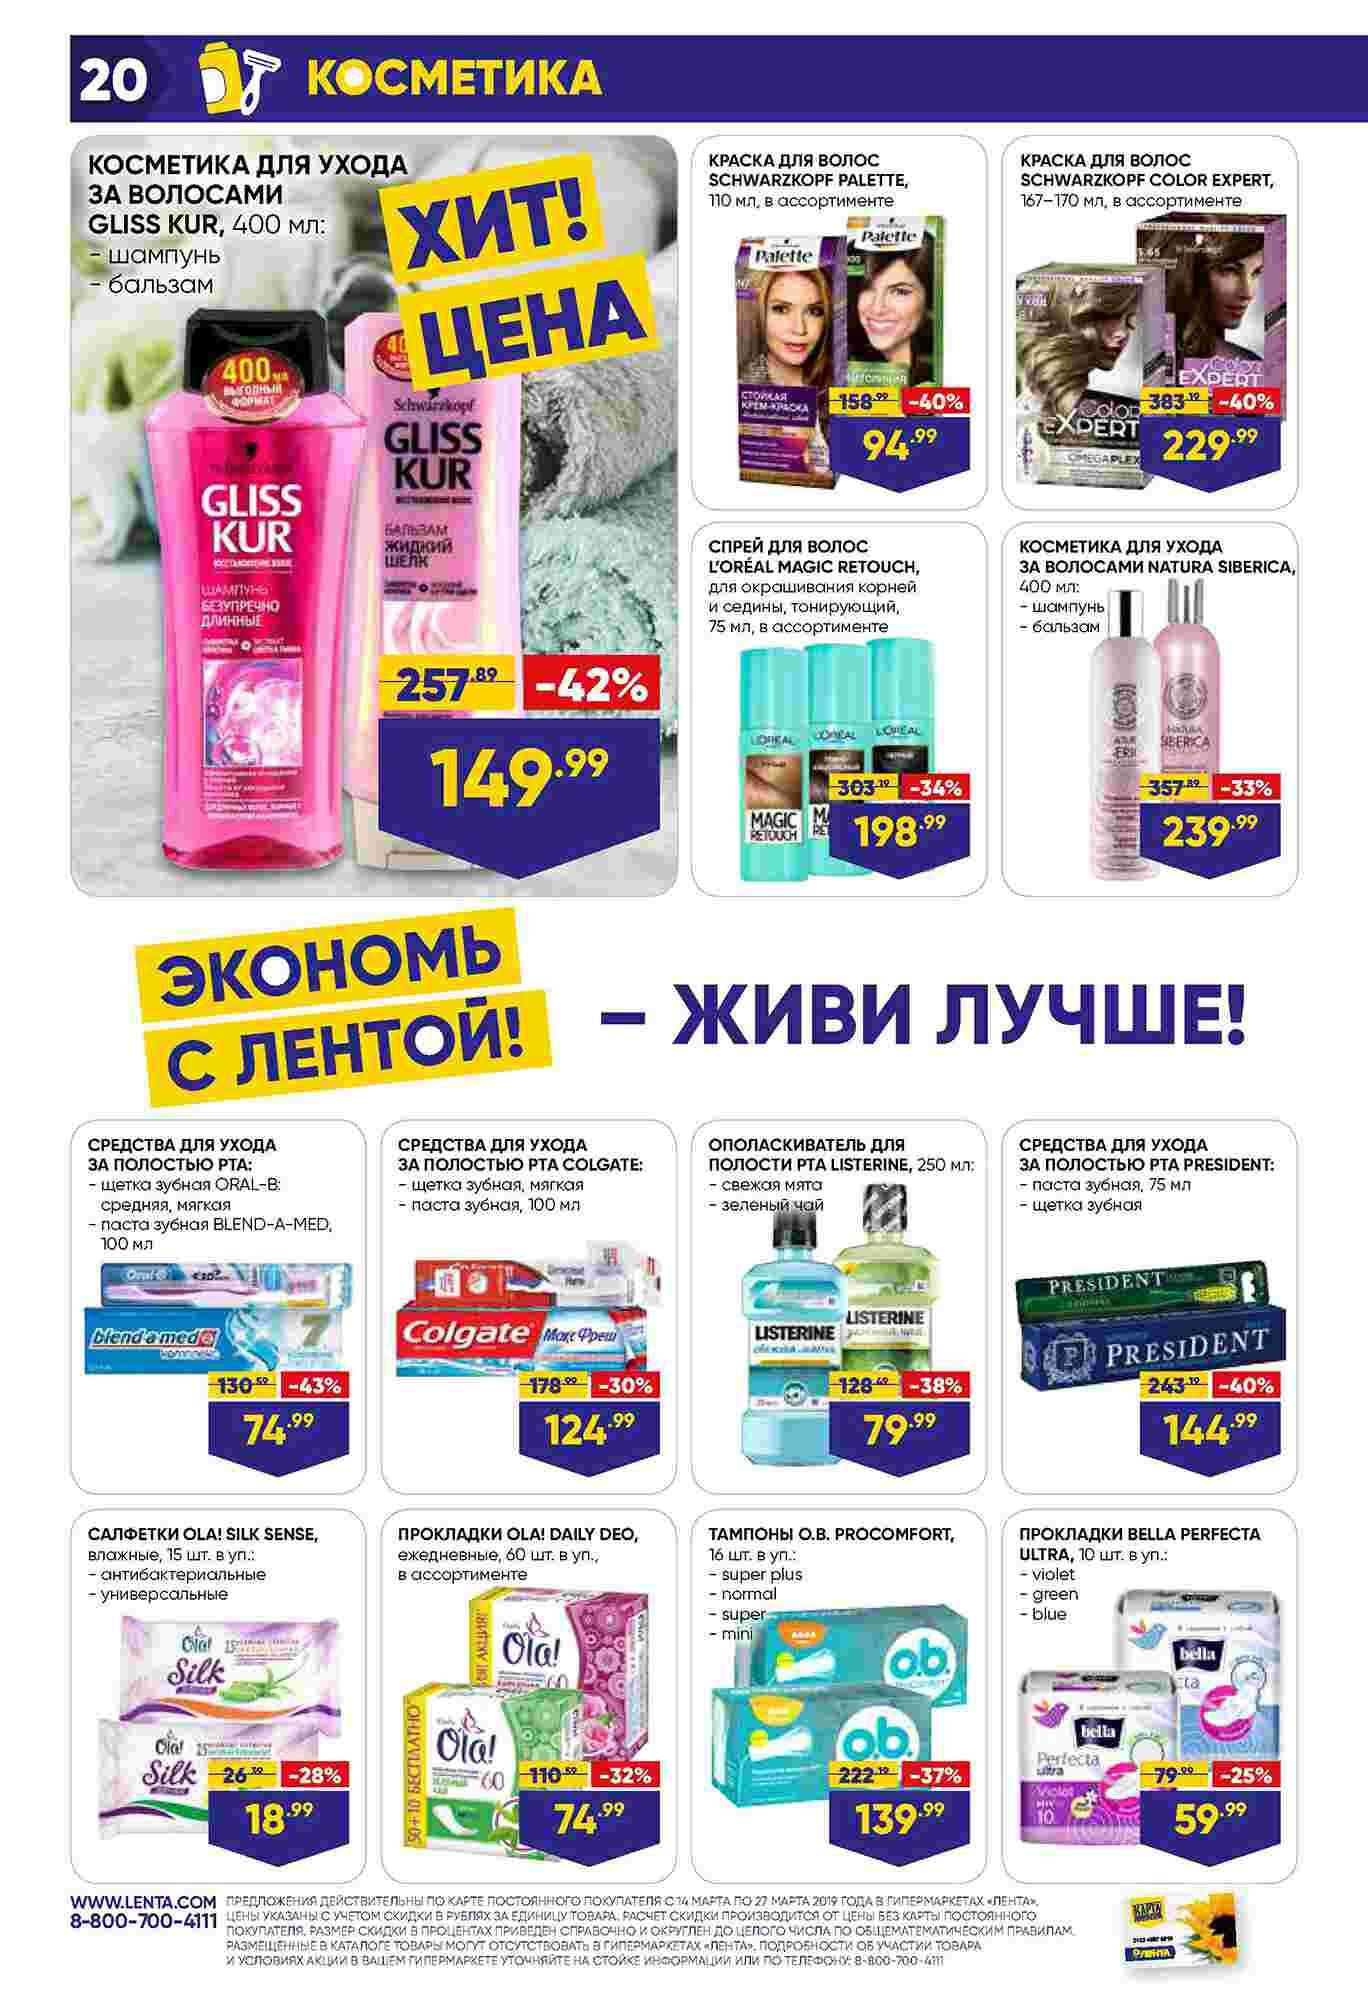 Каталог Лента гипермаркет 14-27.03.2019 стр. - 0001 - 0020